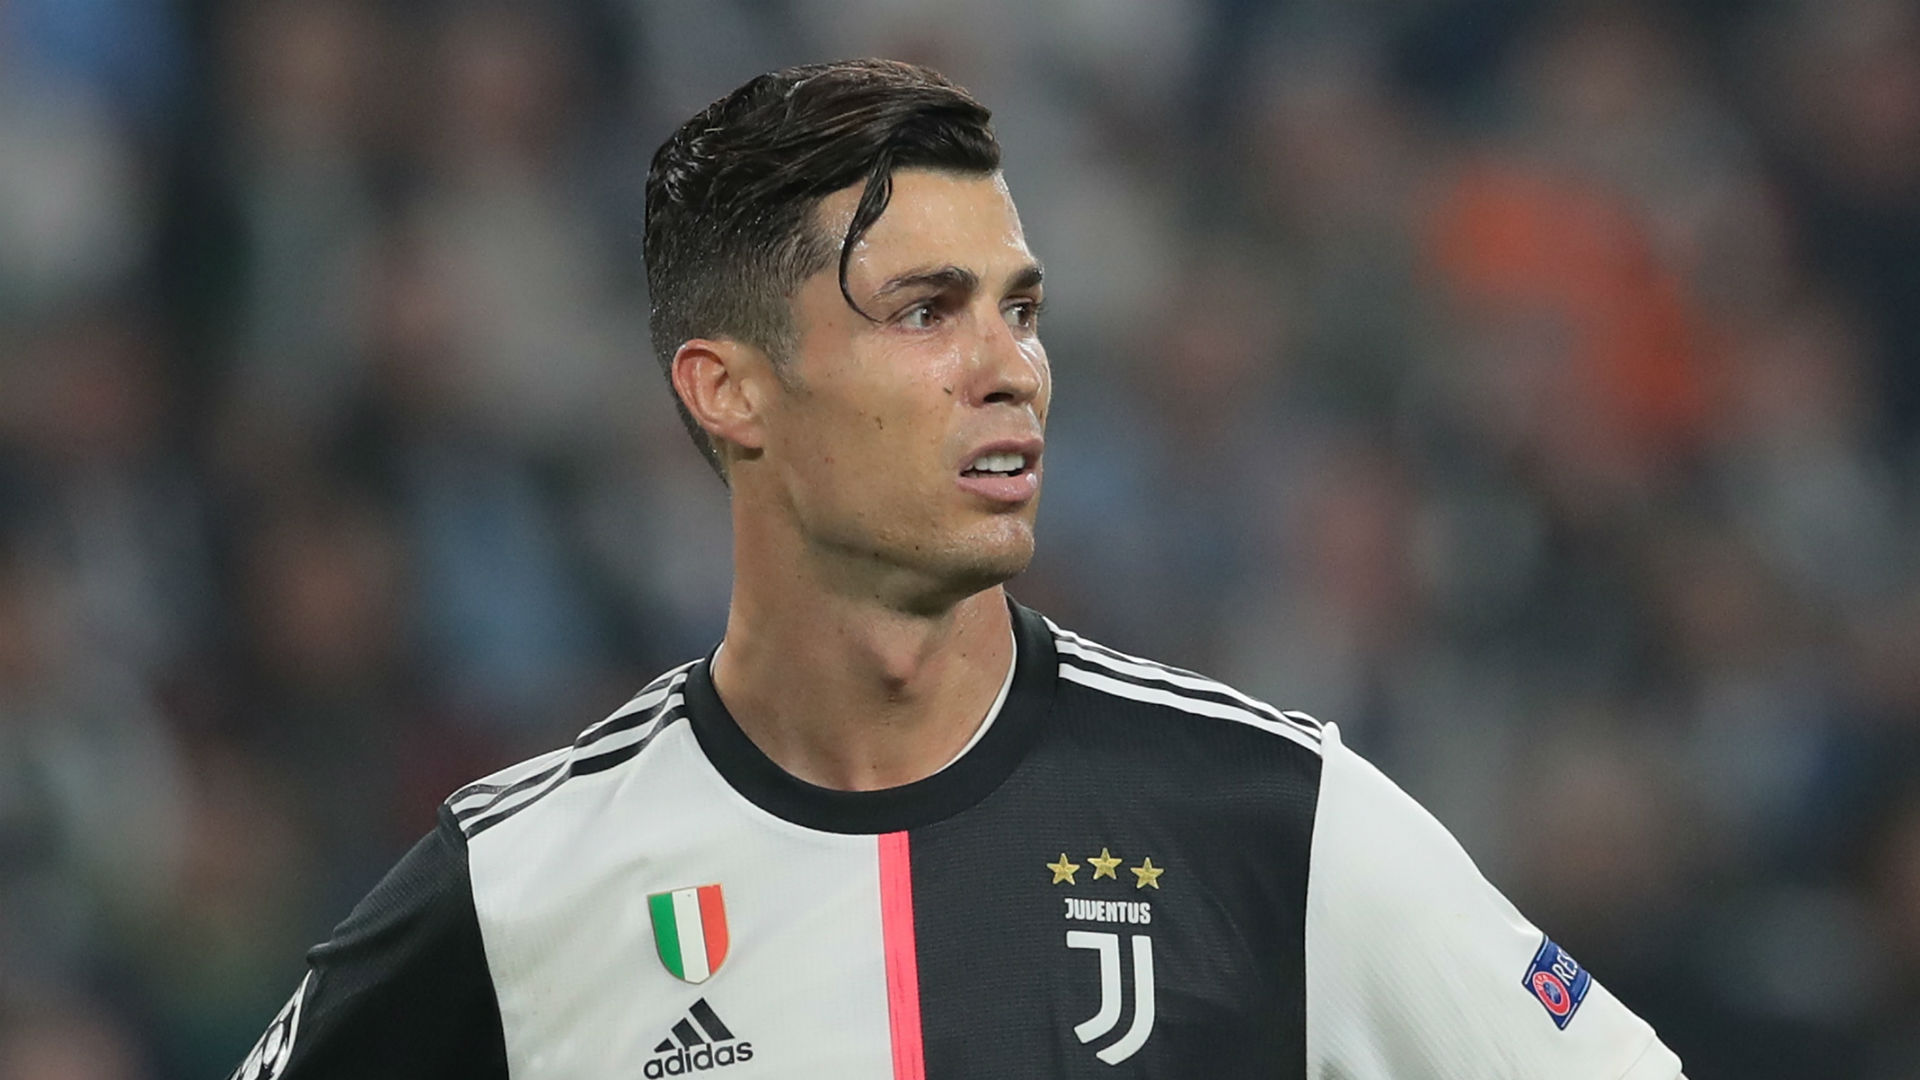 Juventus rest Ronaldo as De Sciglio returns for Lecce trip